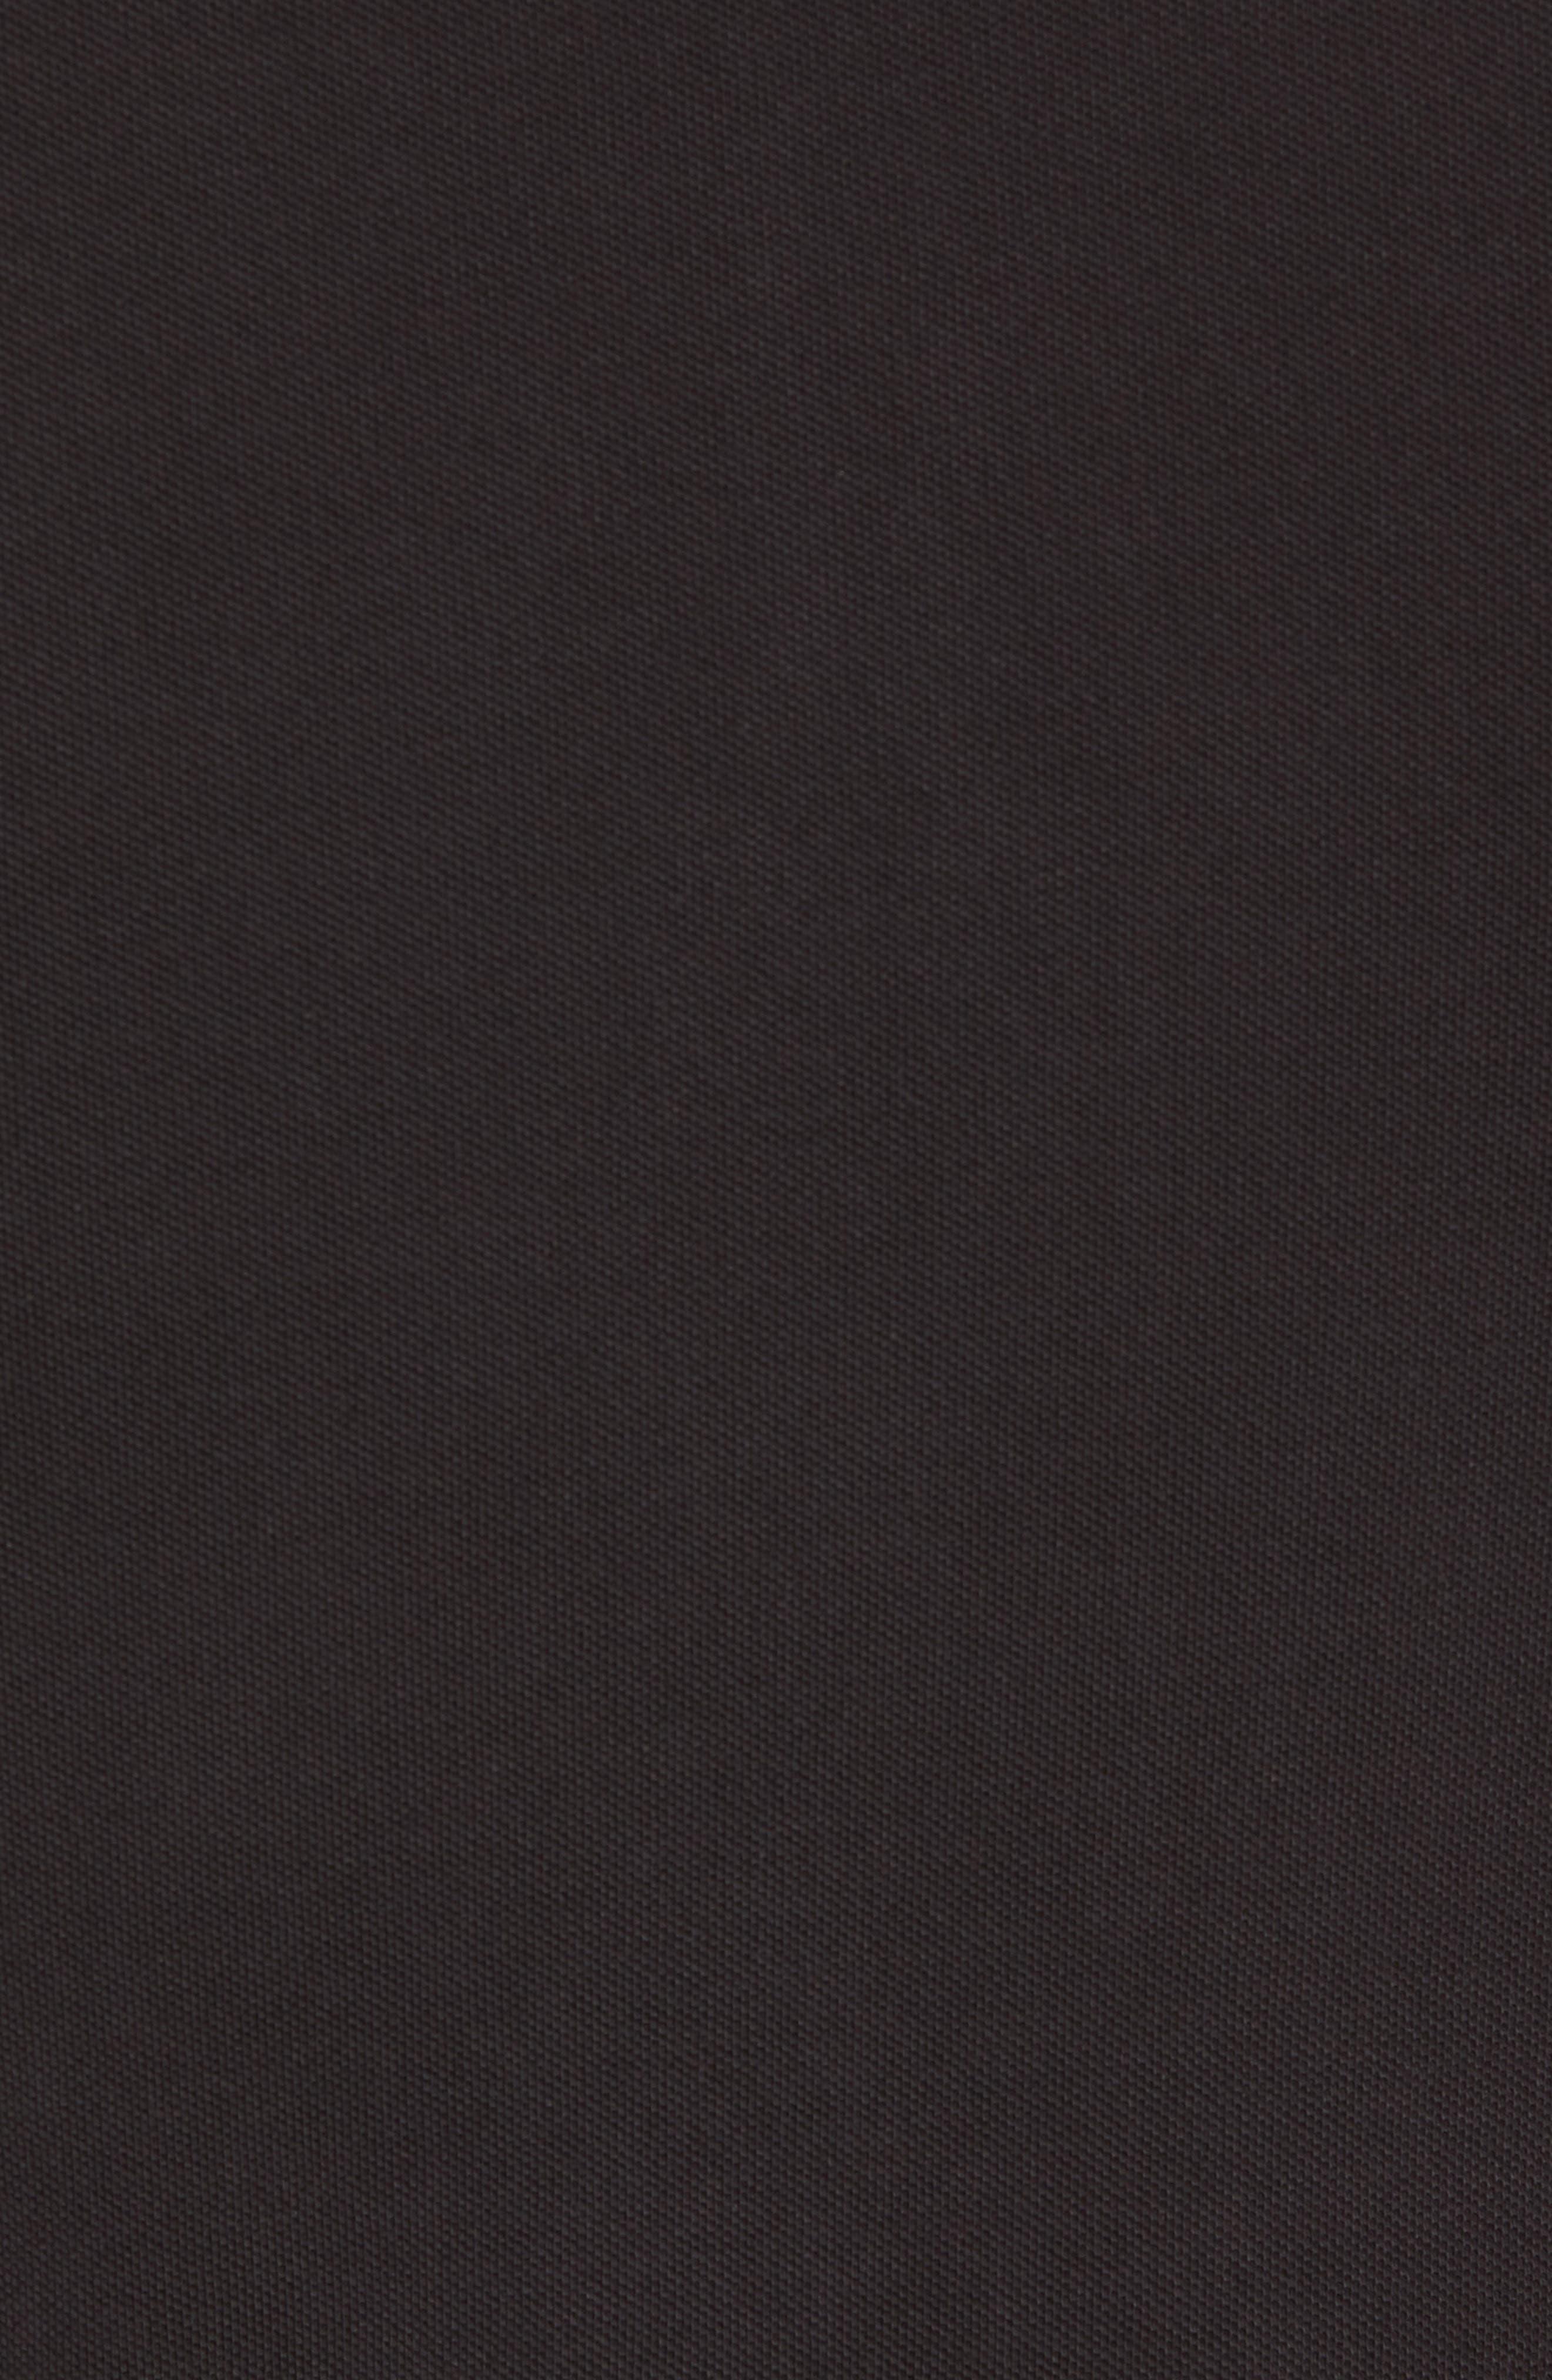 Prime Slim Fit Polo,                             Alternate thumbnail 5, color,                             001